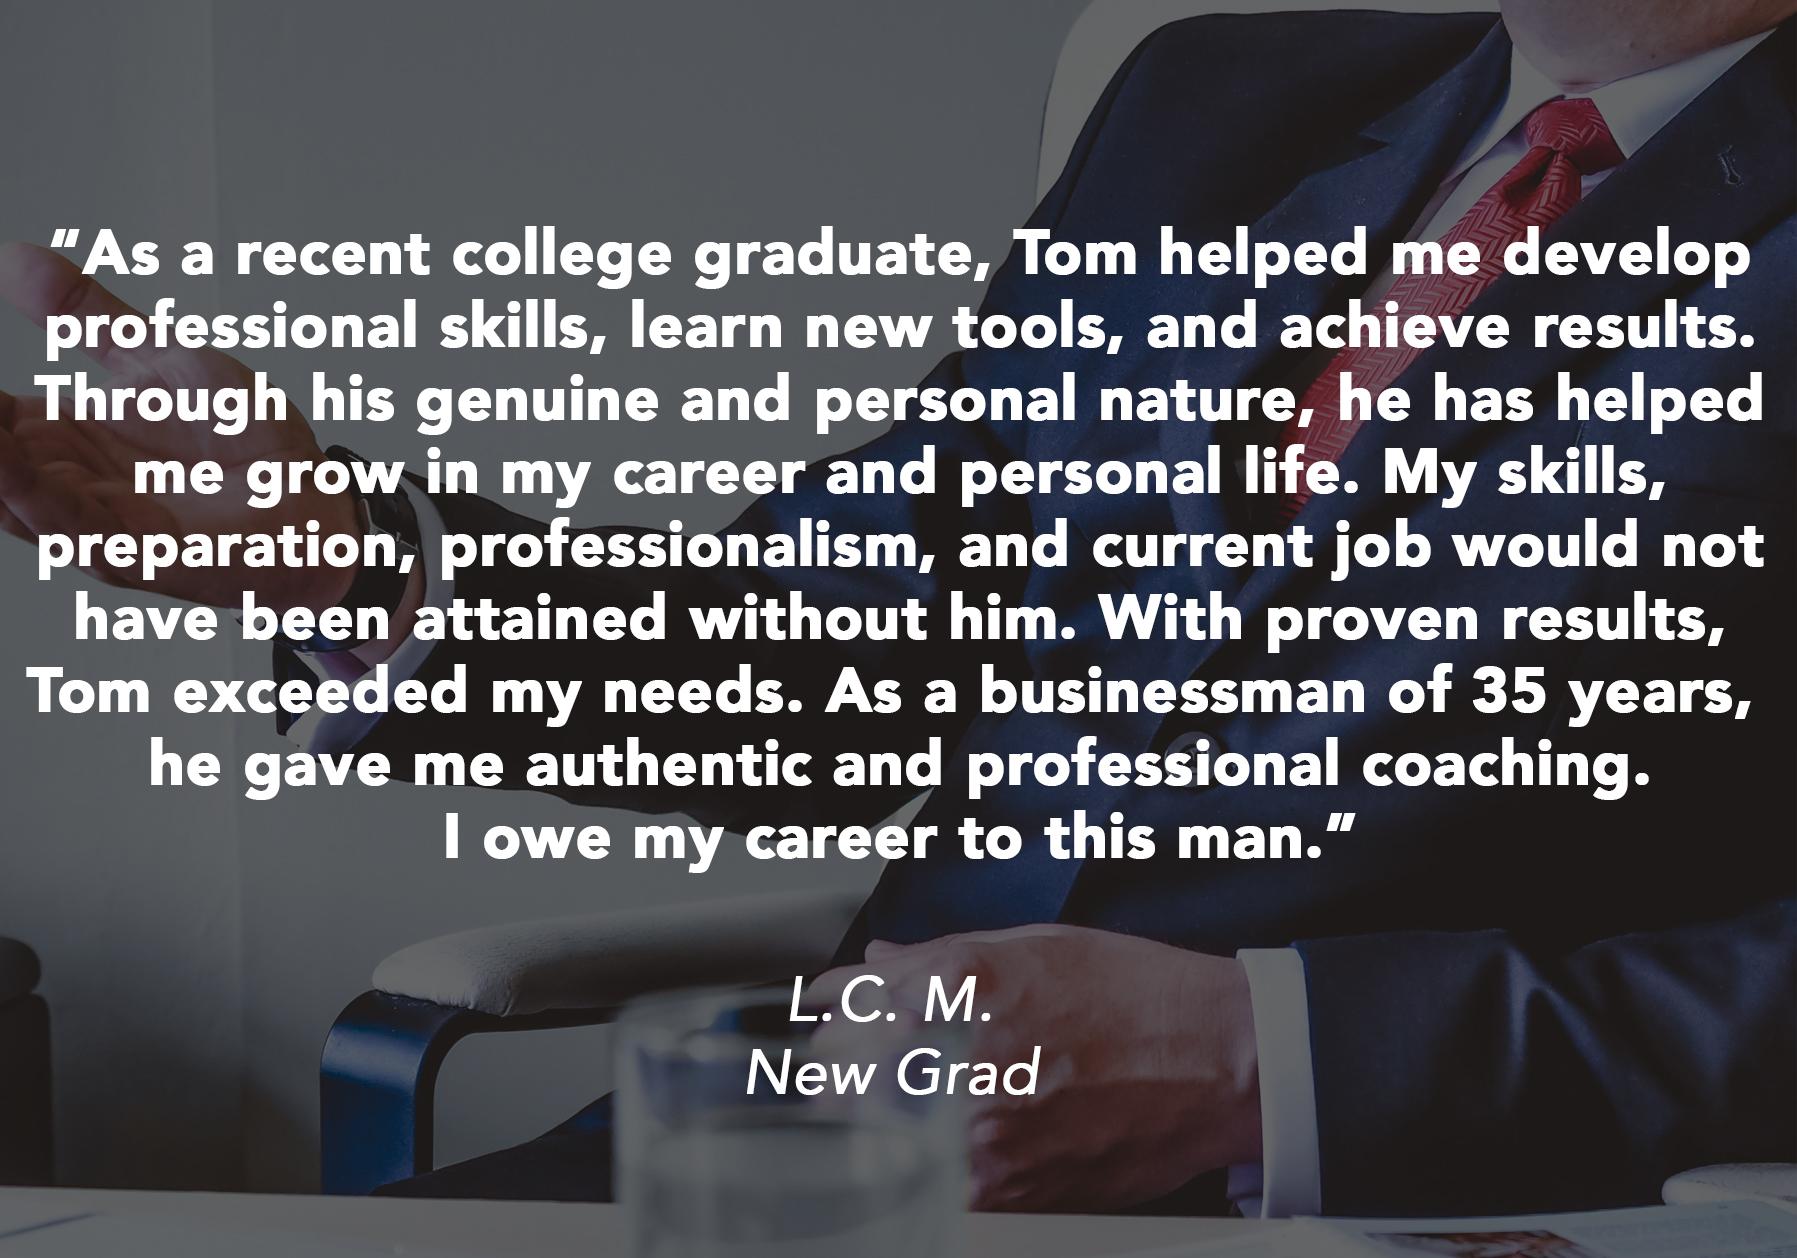 interview coaching solutions job career coach LCM.jpg